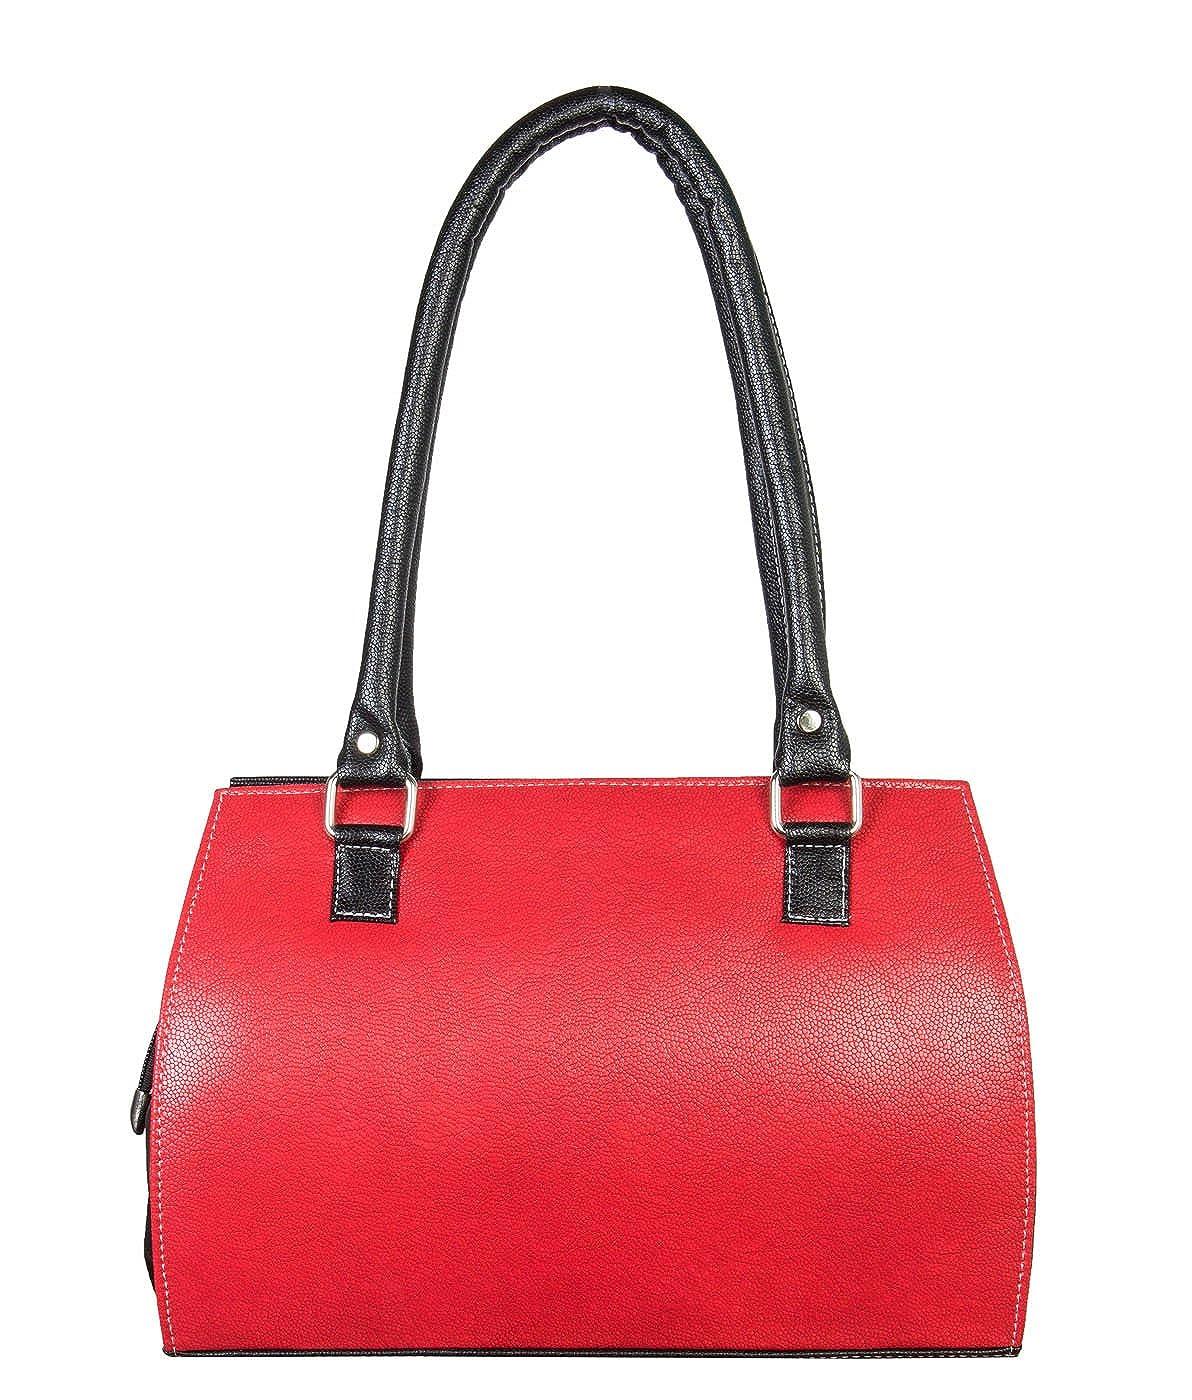 4a767914fe Louise Belgium Designer Handbag for Women Shoulder Bag - Red  Amazon.in   Shoes   Handbags